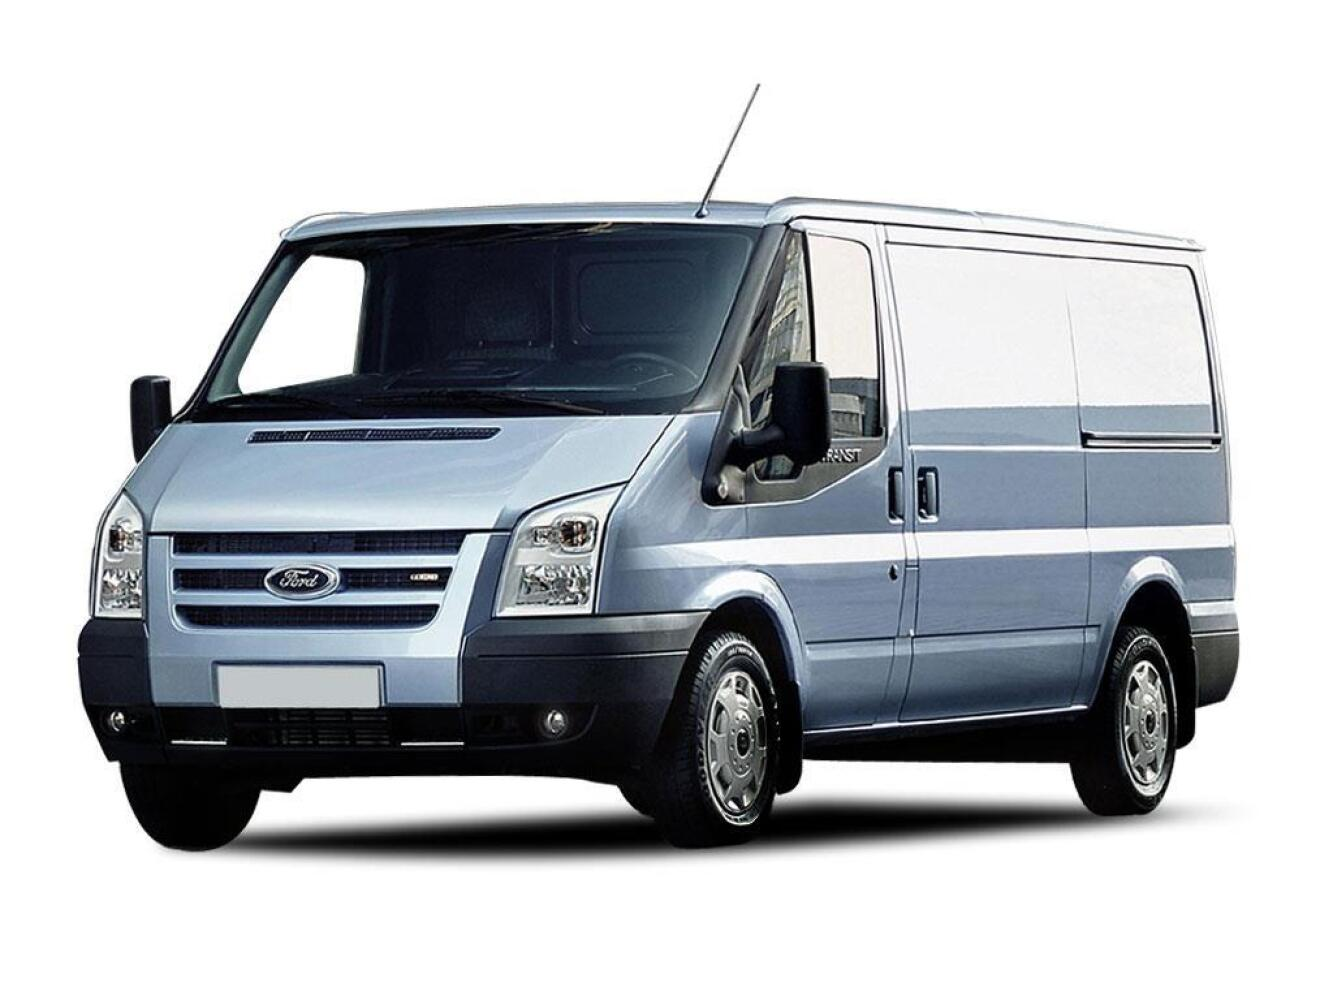 53bfa4fe56 New Ford Transit 460El Lwb Diesel Rwd H Roof Jumbo Van TDCi 155ps ...